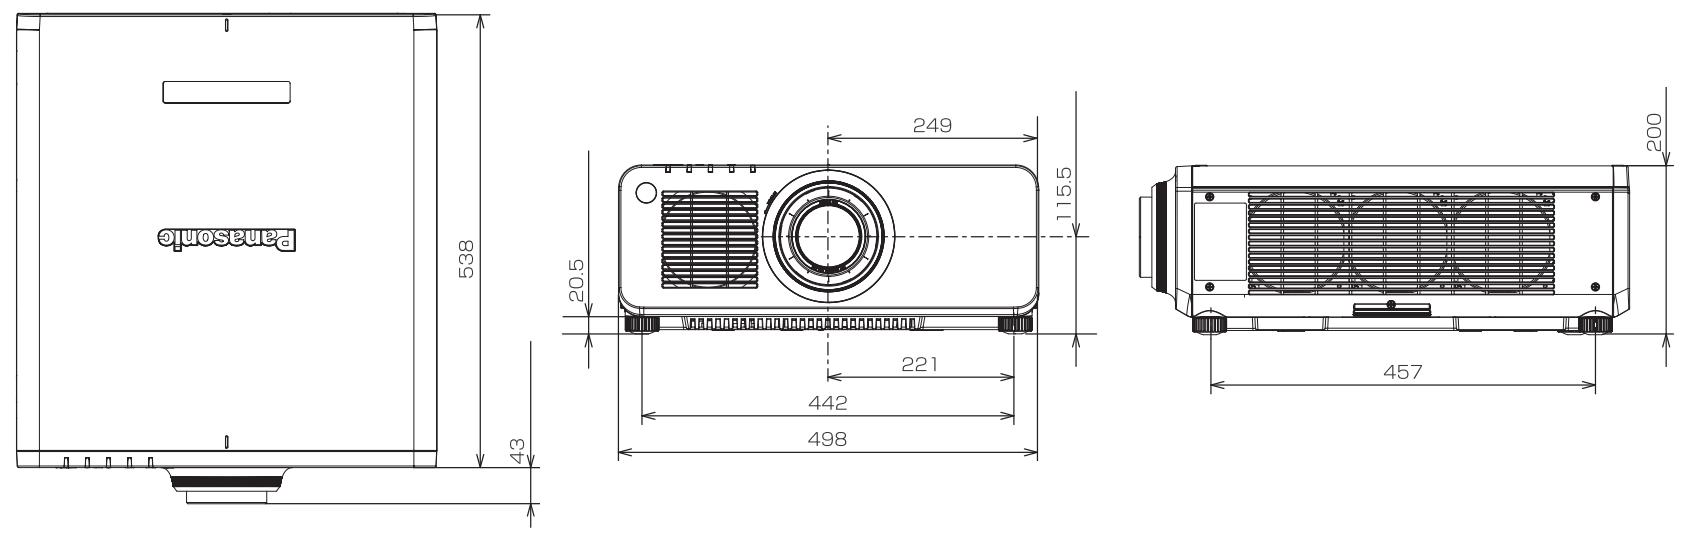 Panasonic 1チップDLPプロジェクター(PT-RW620JB)